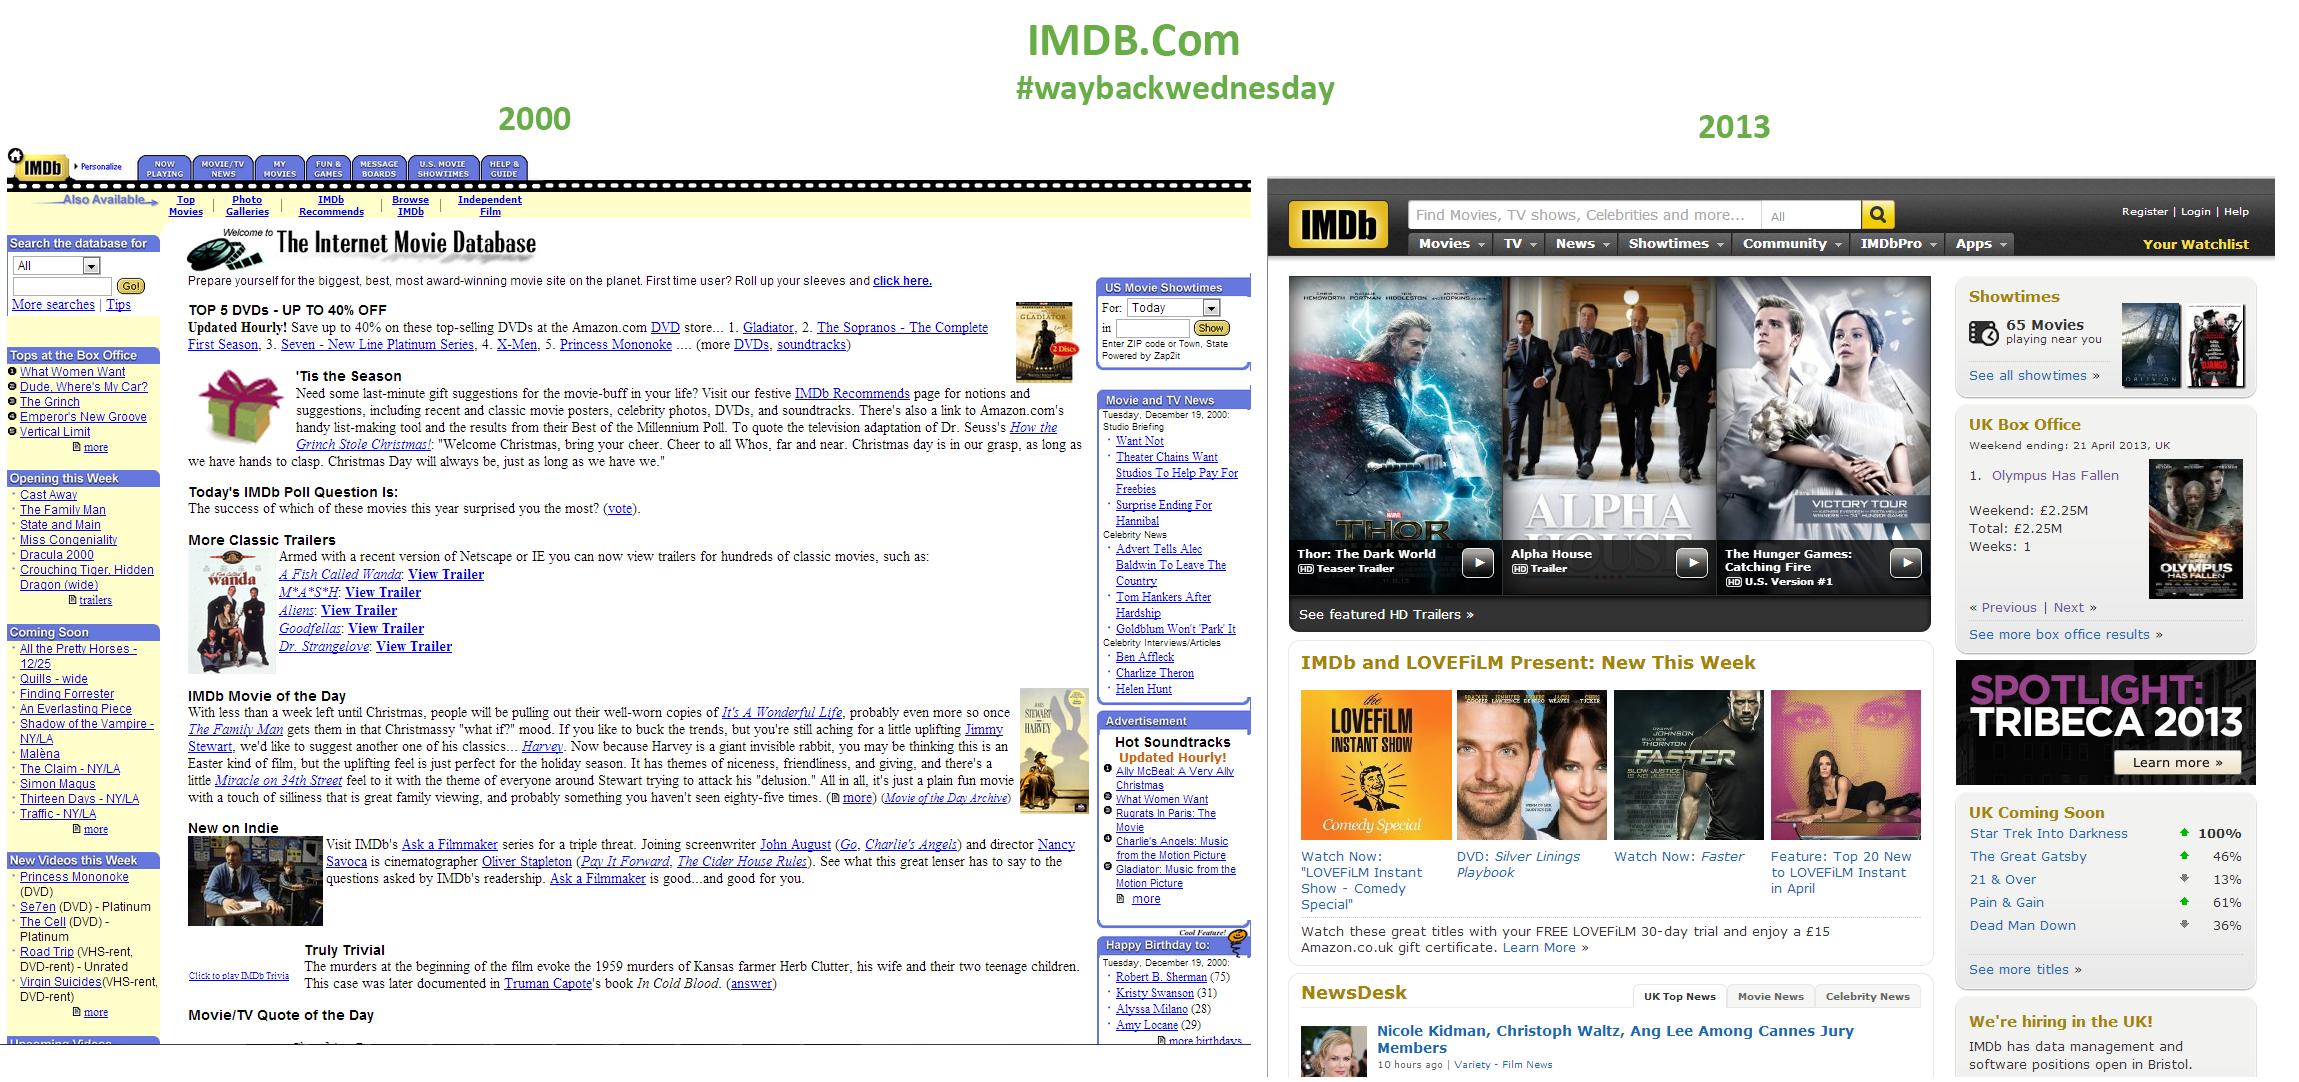 IMDB website evolved